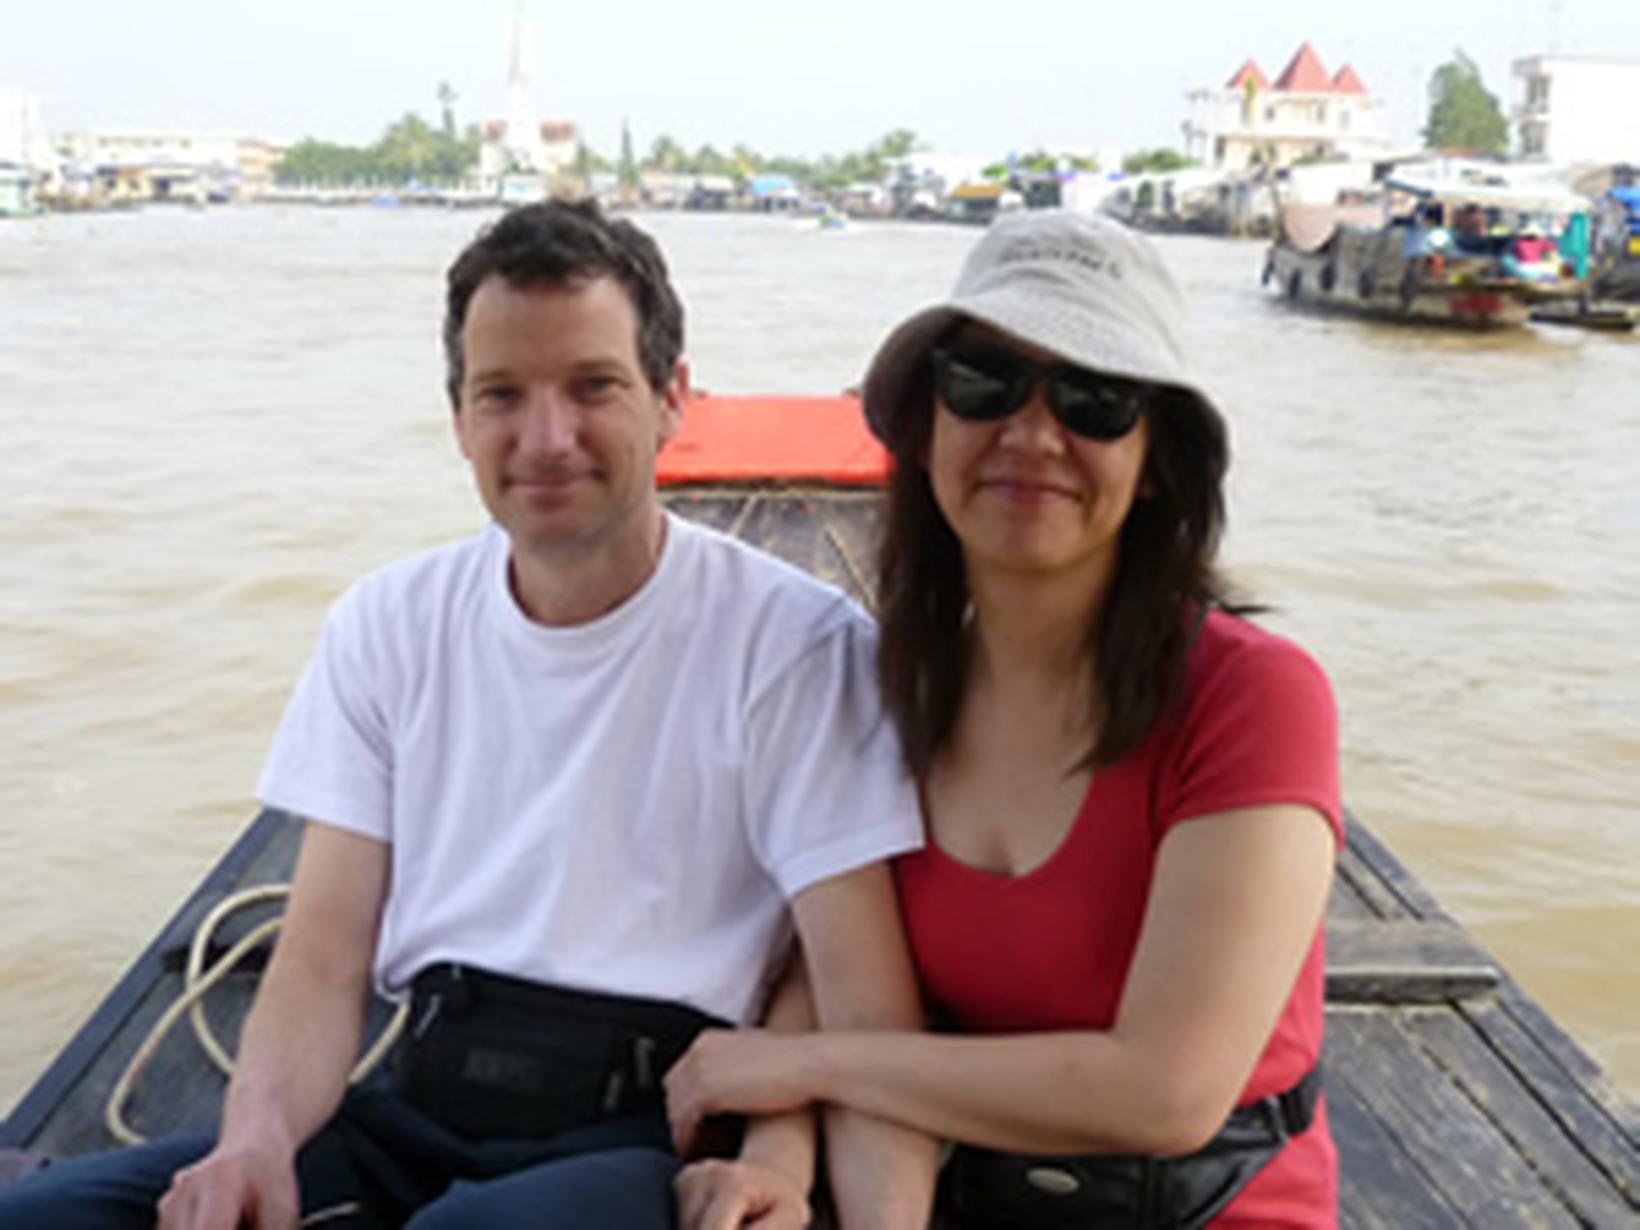 Fiona & Chris from Bendigo, Victoria, Australia